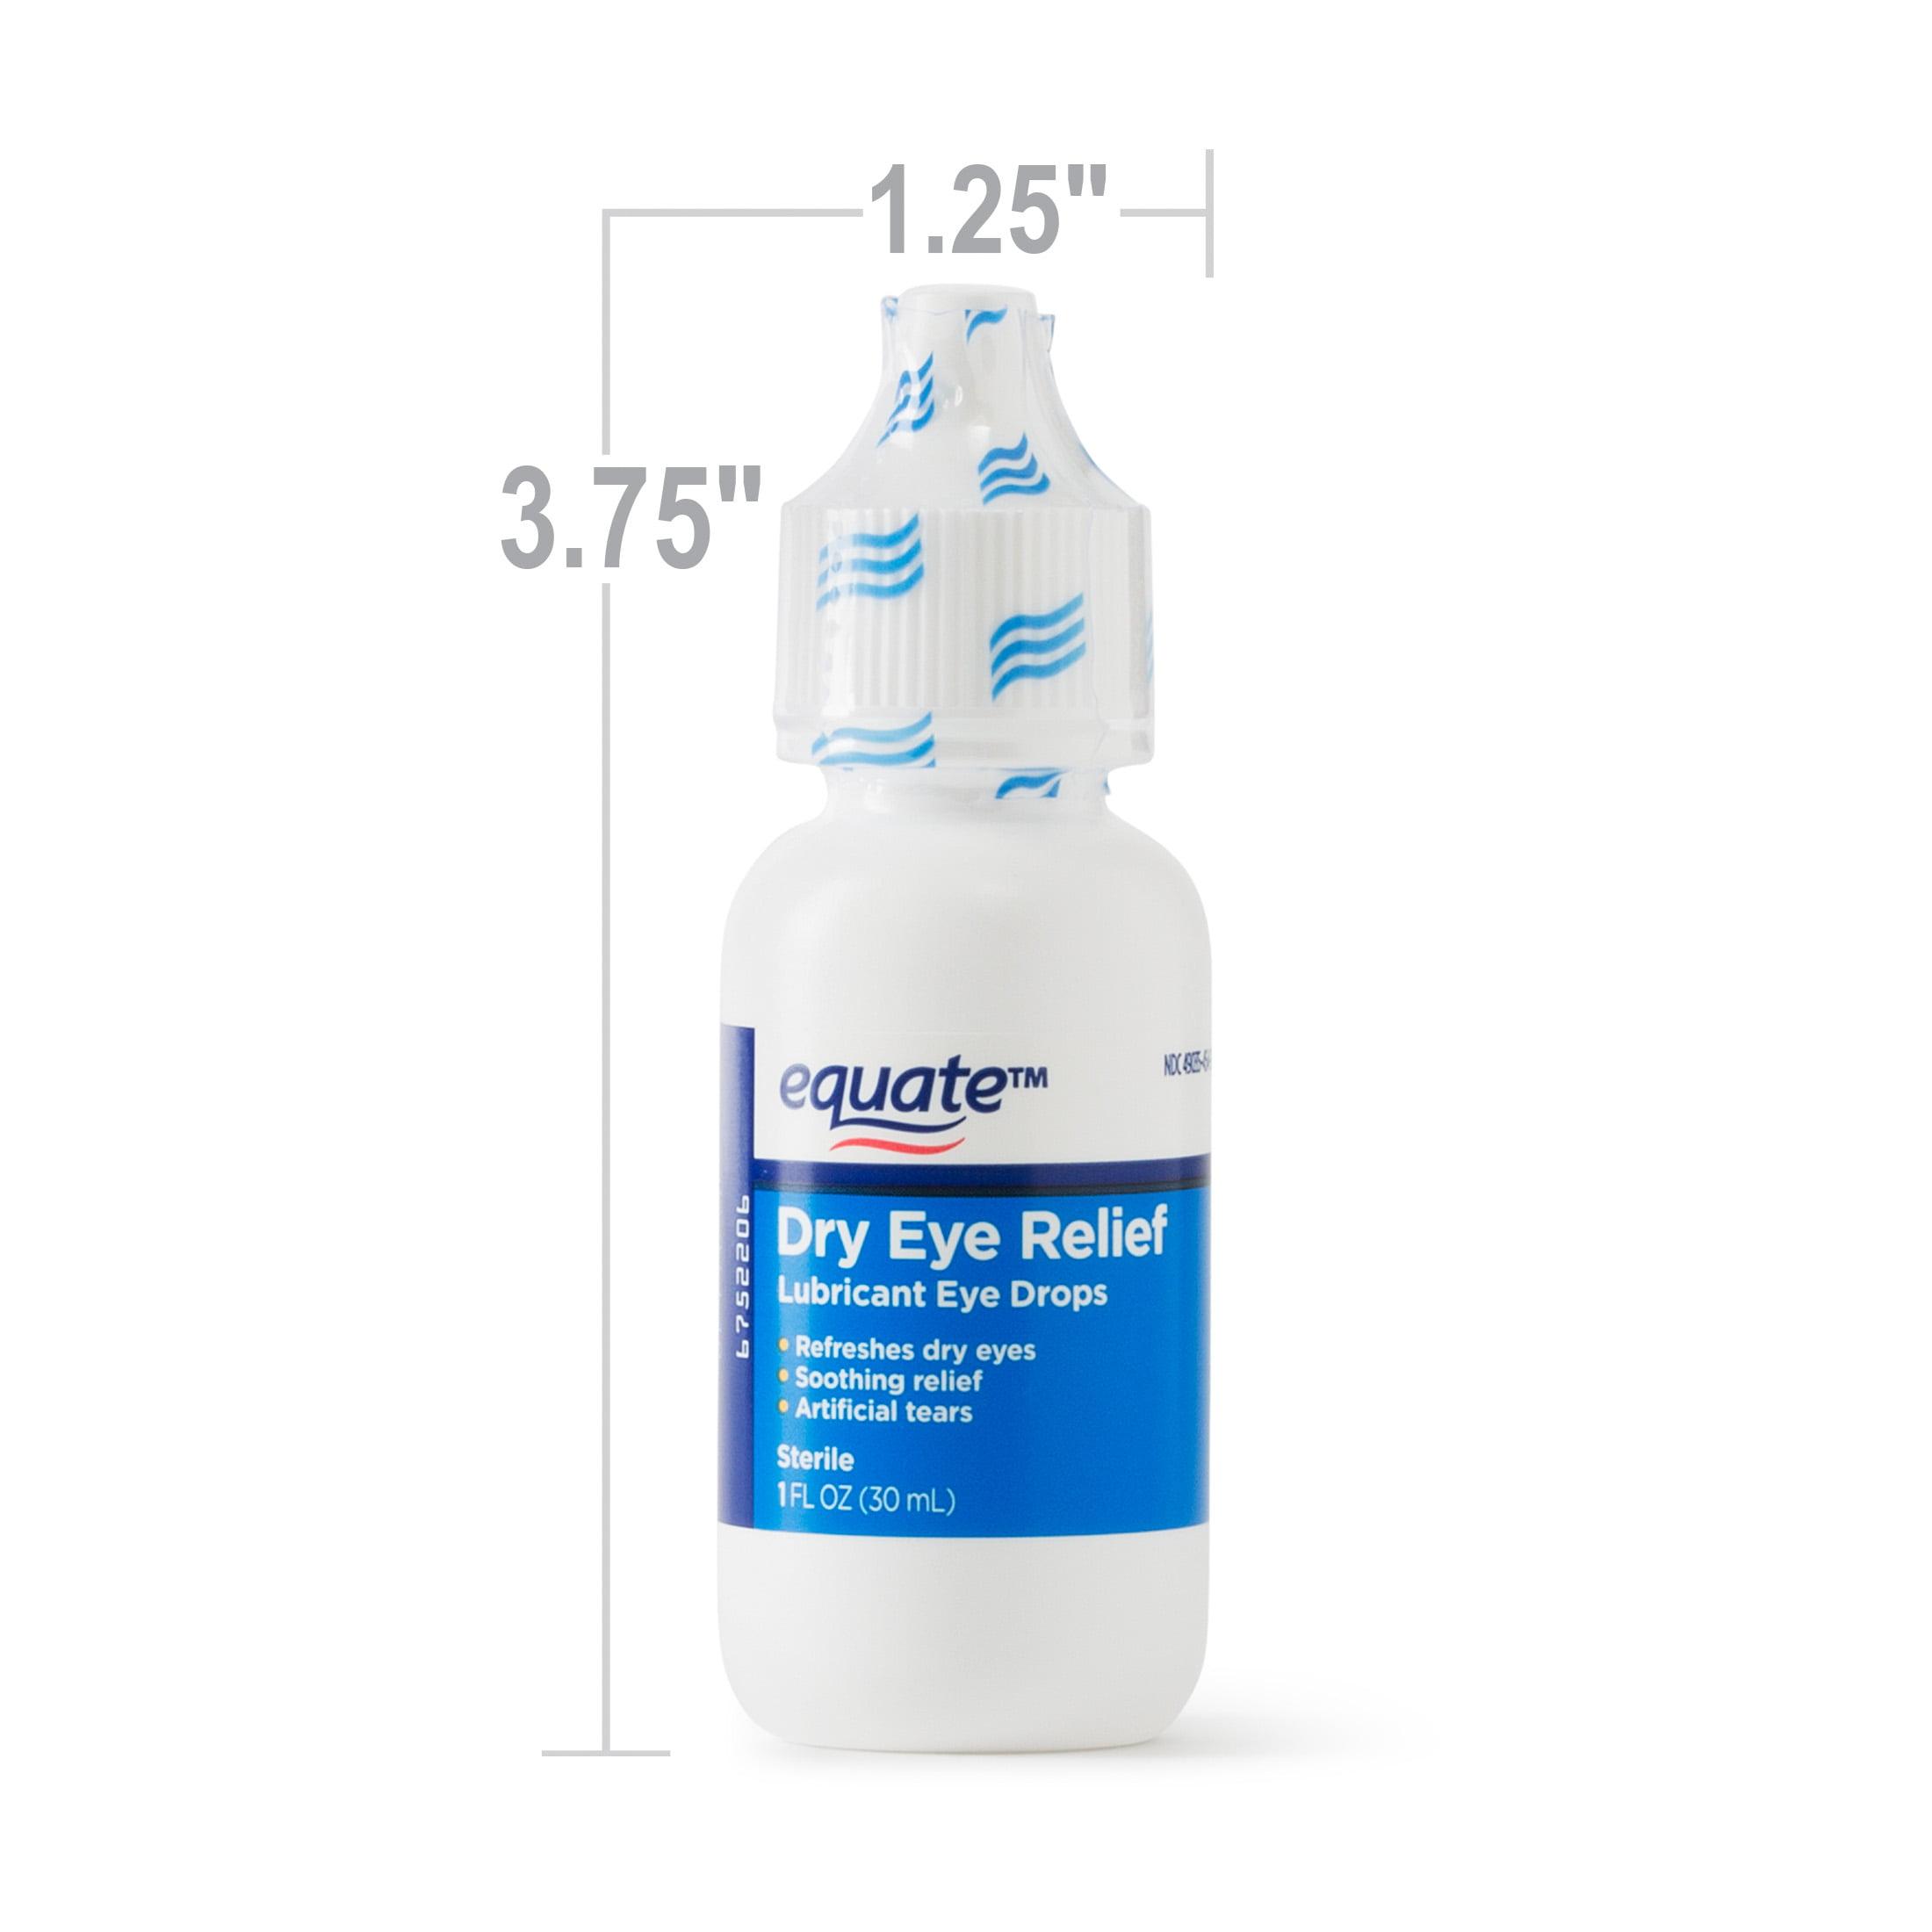 Equate Dry Eye Relief Lubricant Eye Drops Liquid 1 Oz Walmartcom